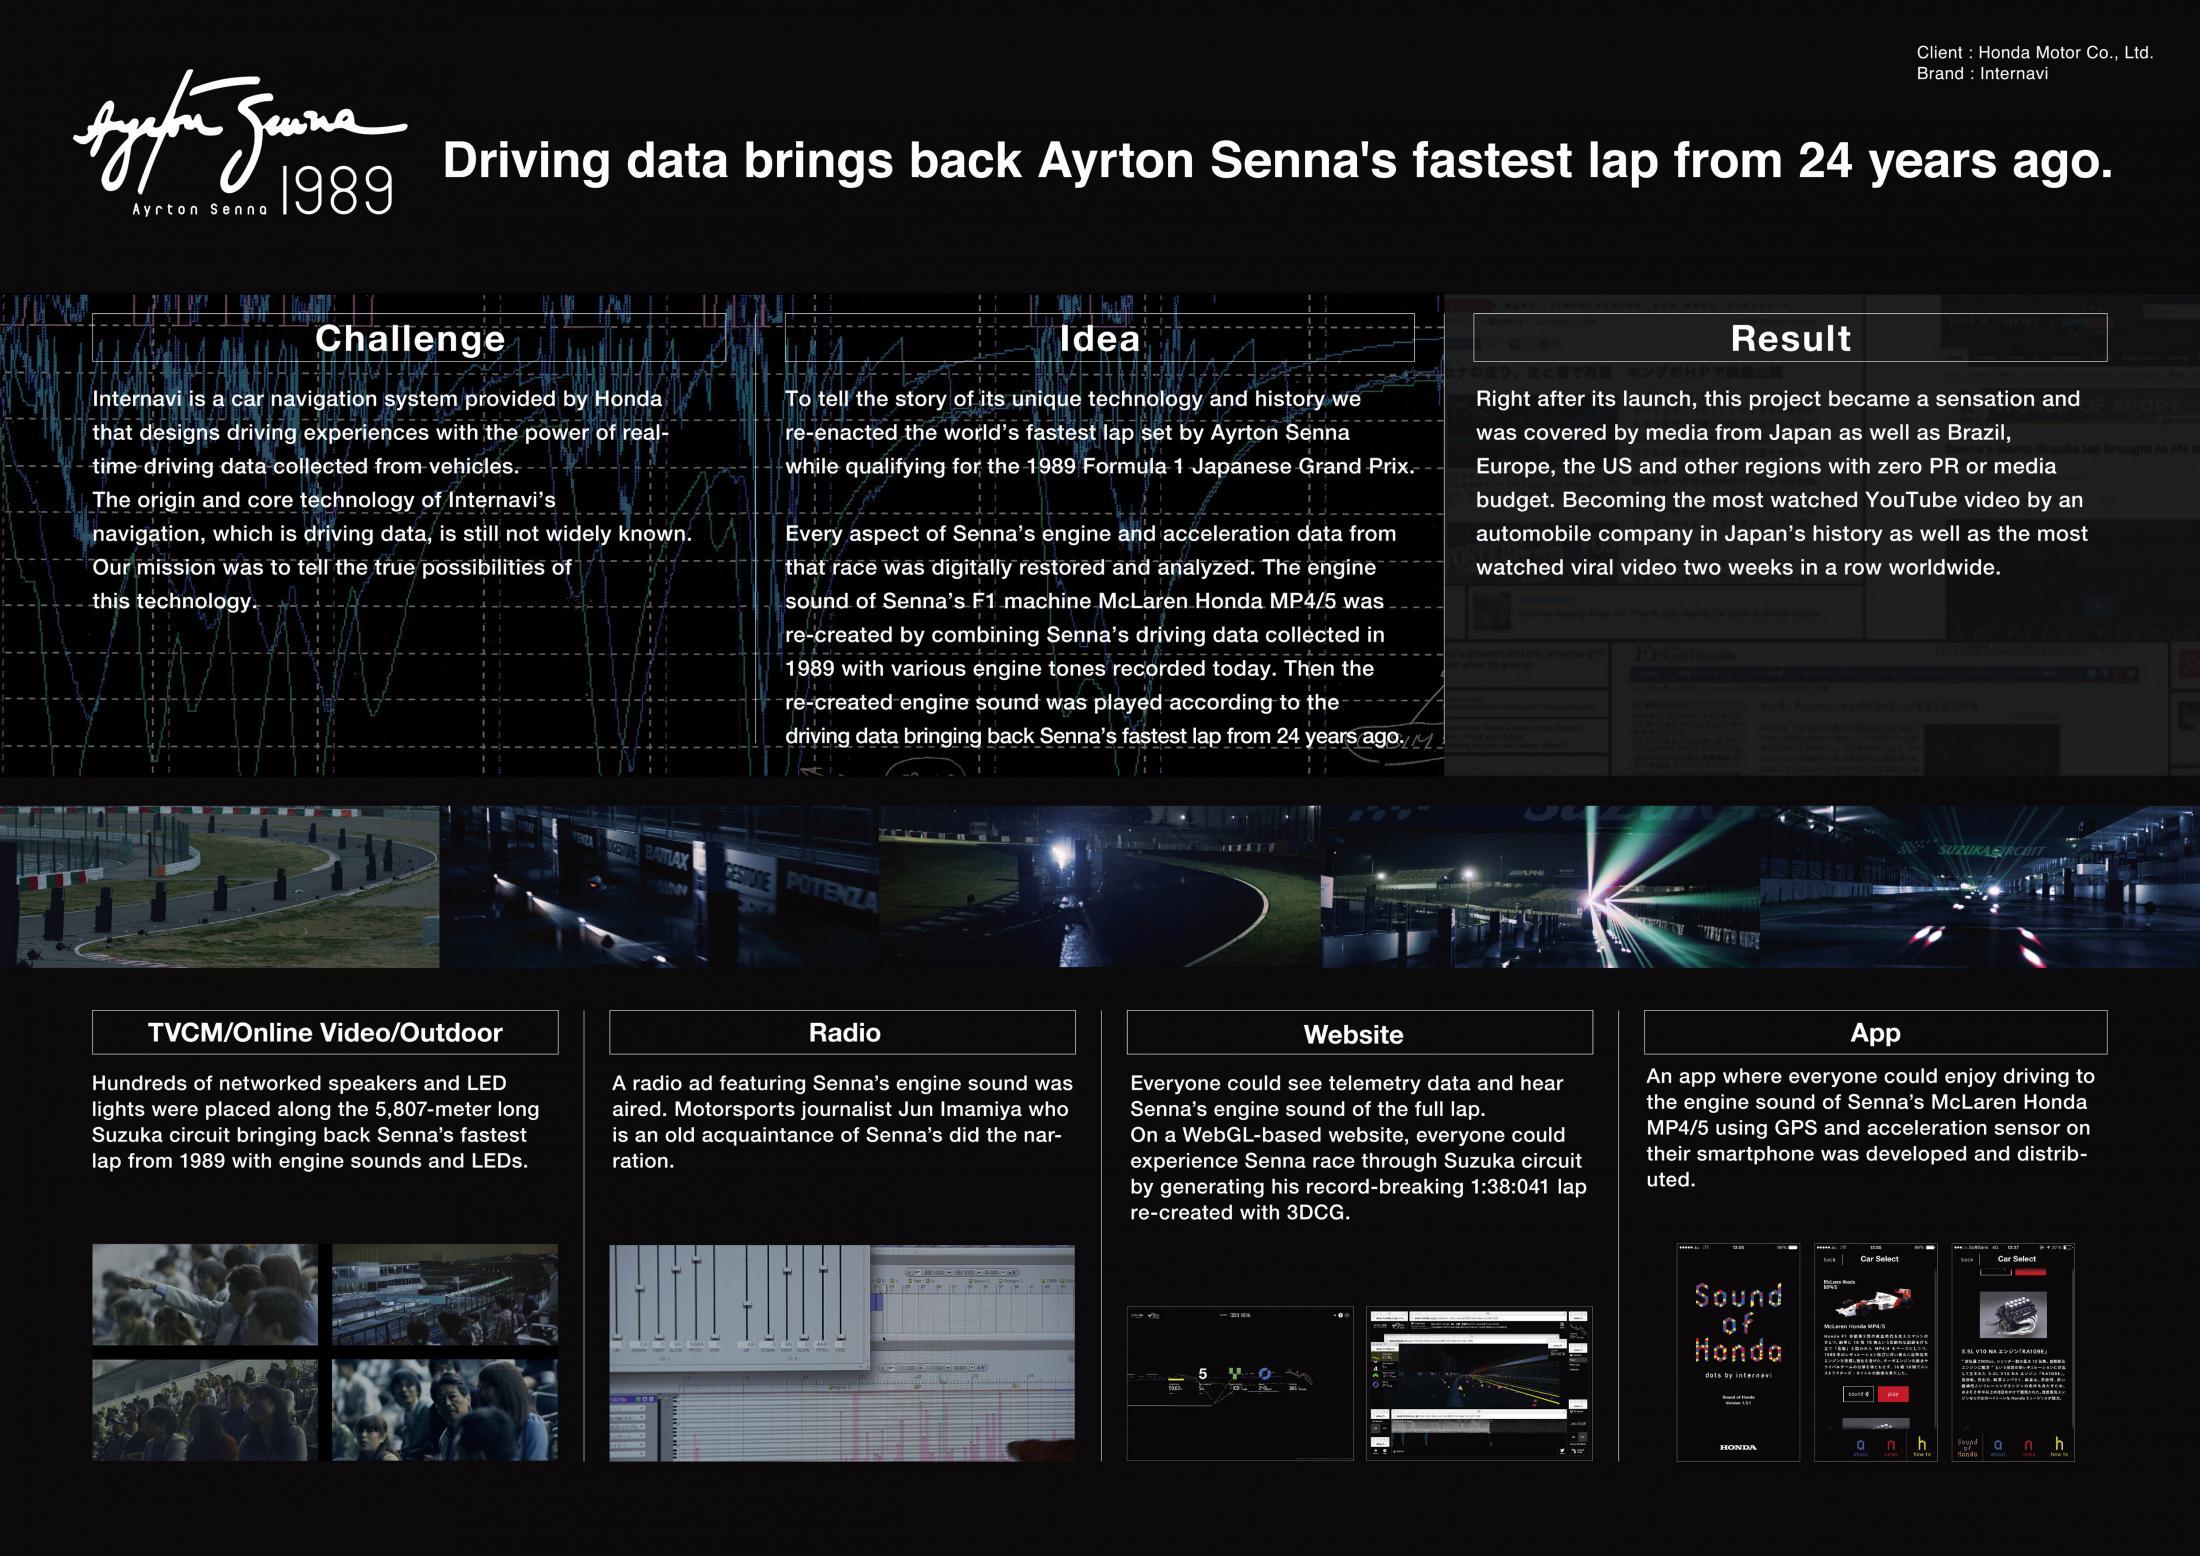 Thumbnail for Sound of Honda / Ayrton Senna 1989